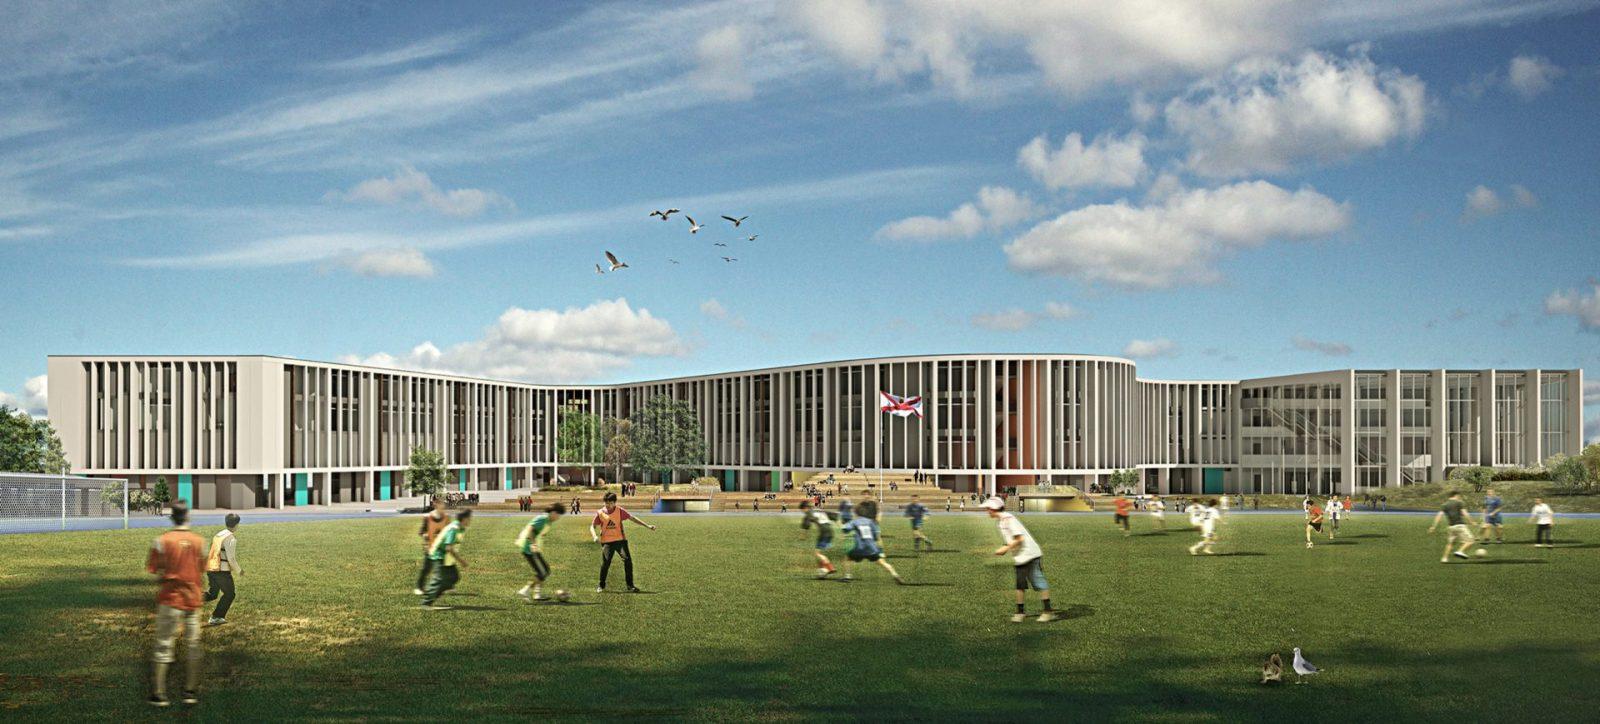 Les Quennevais Secondary School Jersey Architects